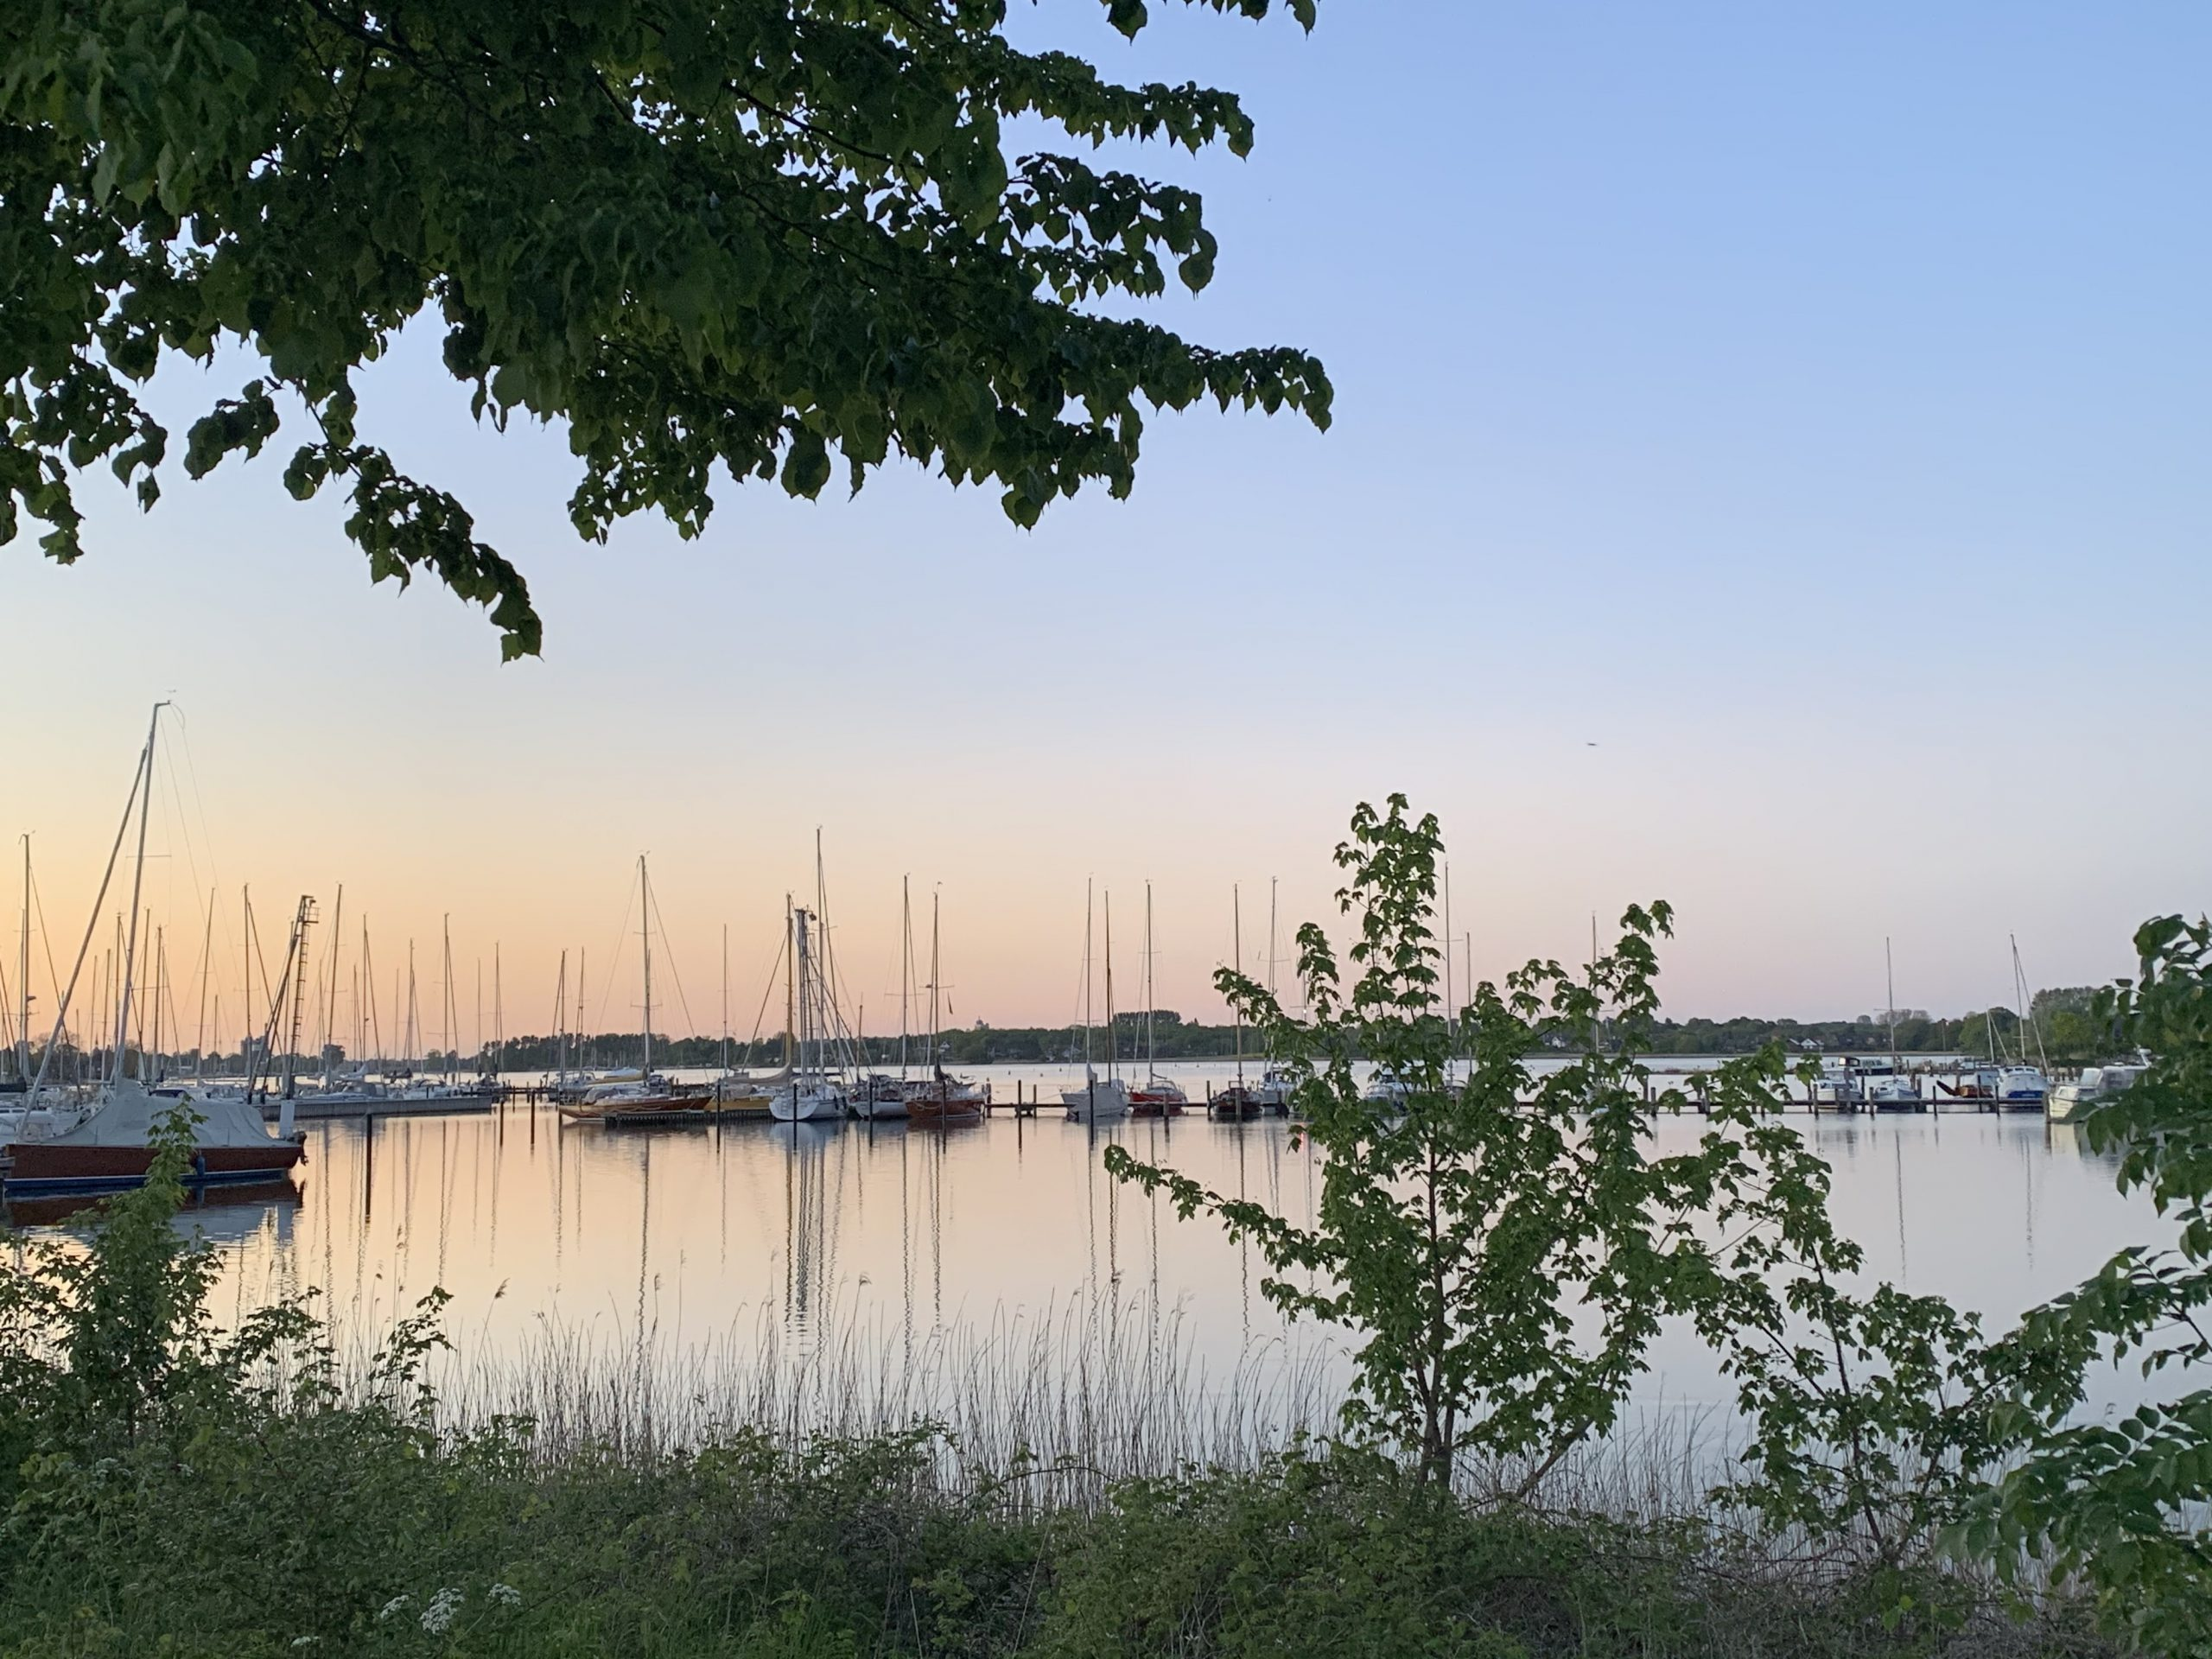 Hafen in Arnis